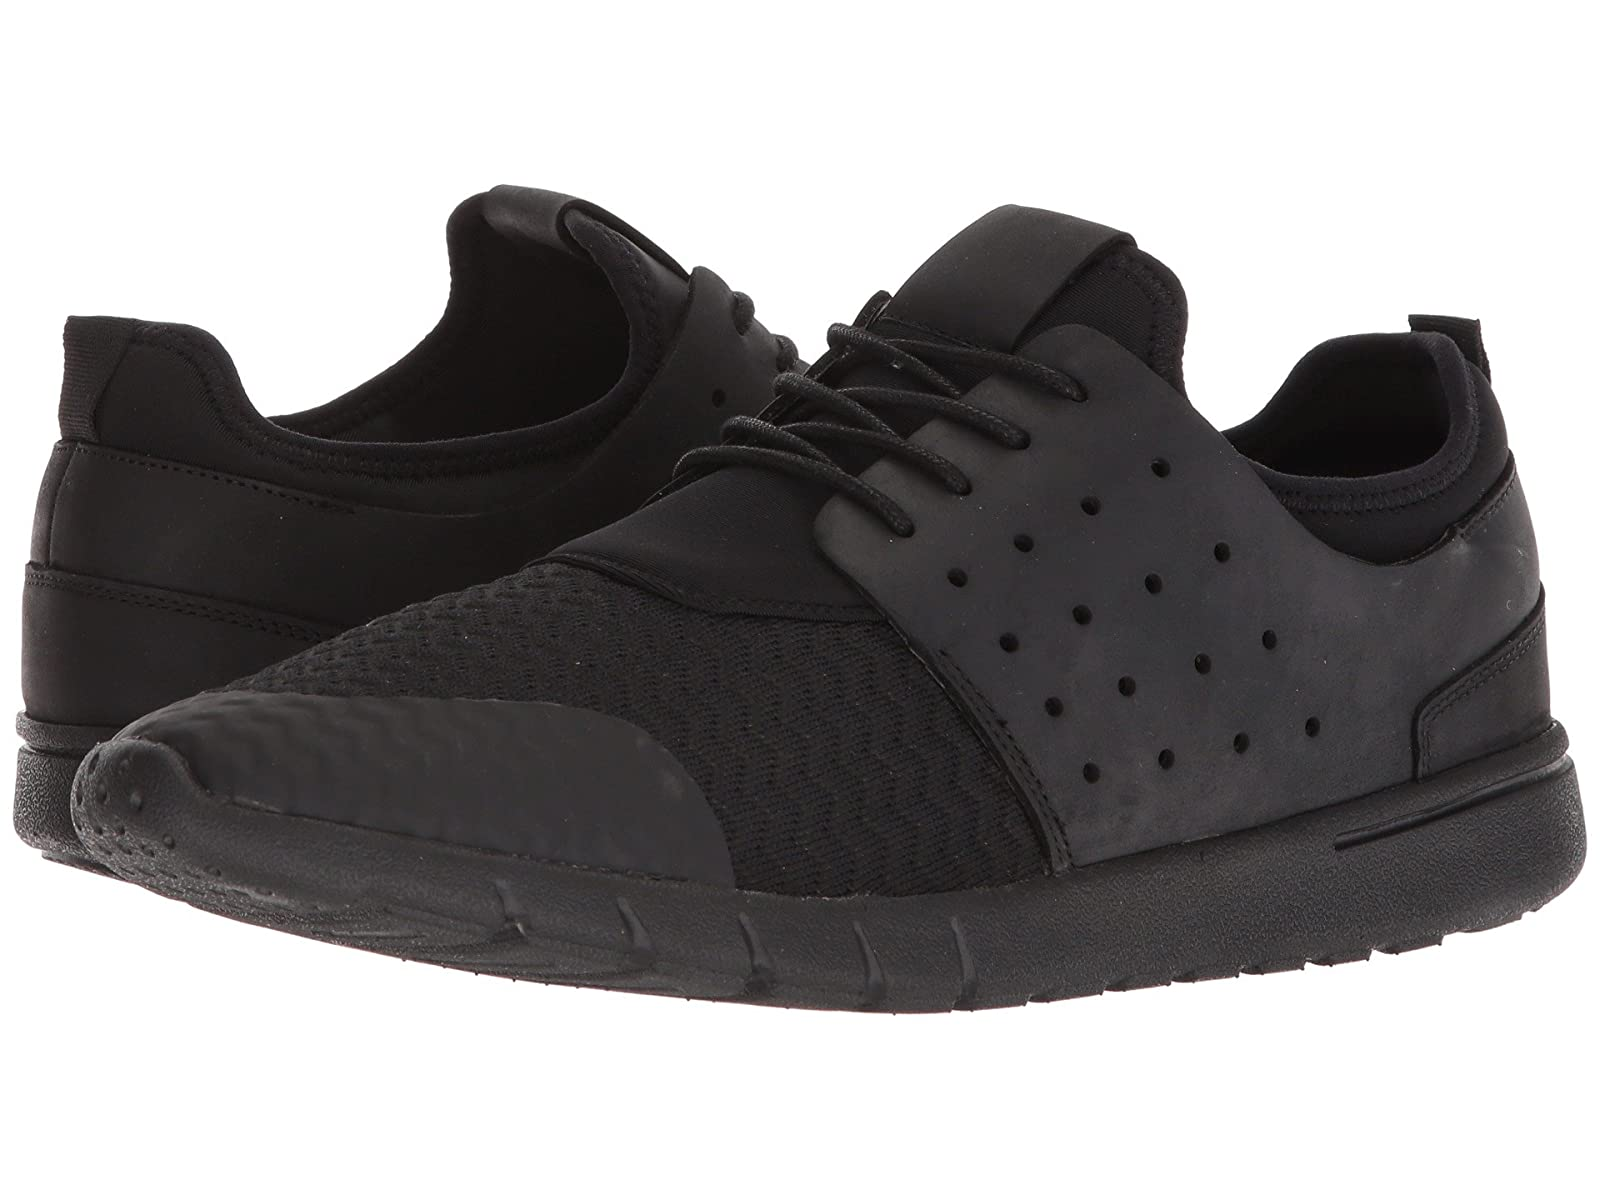 Dr. Scholl's Vision - Original CollectionAtmospheric grades have affordable shoes